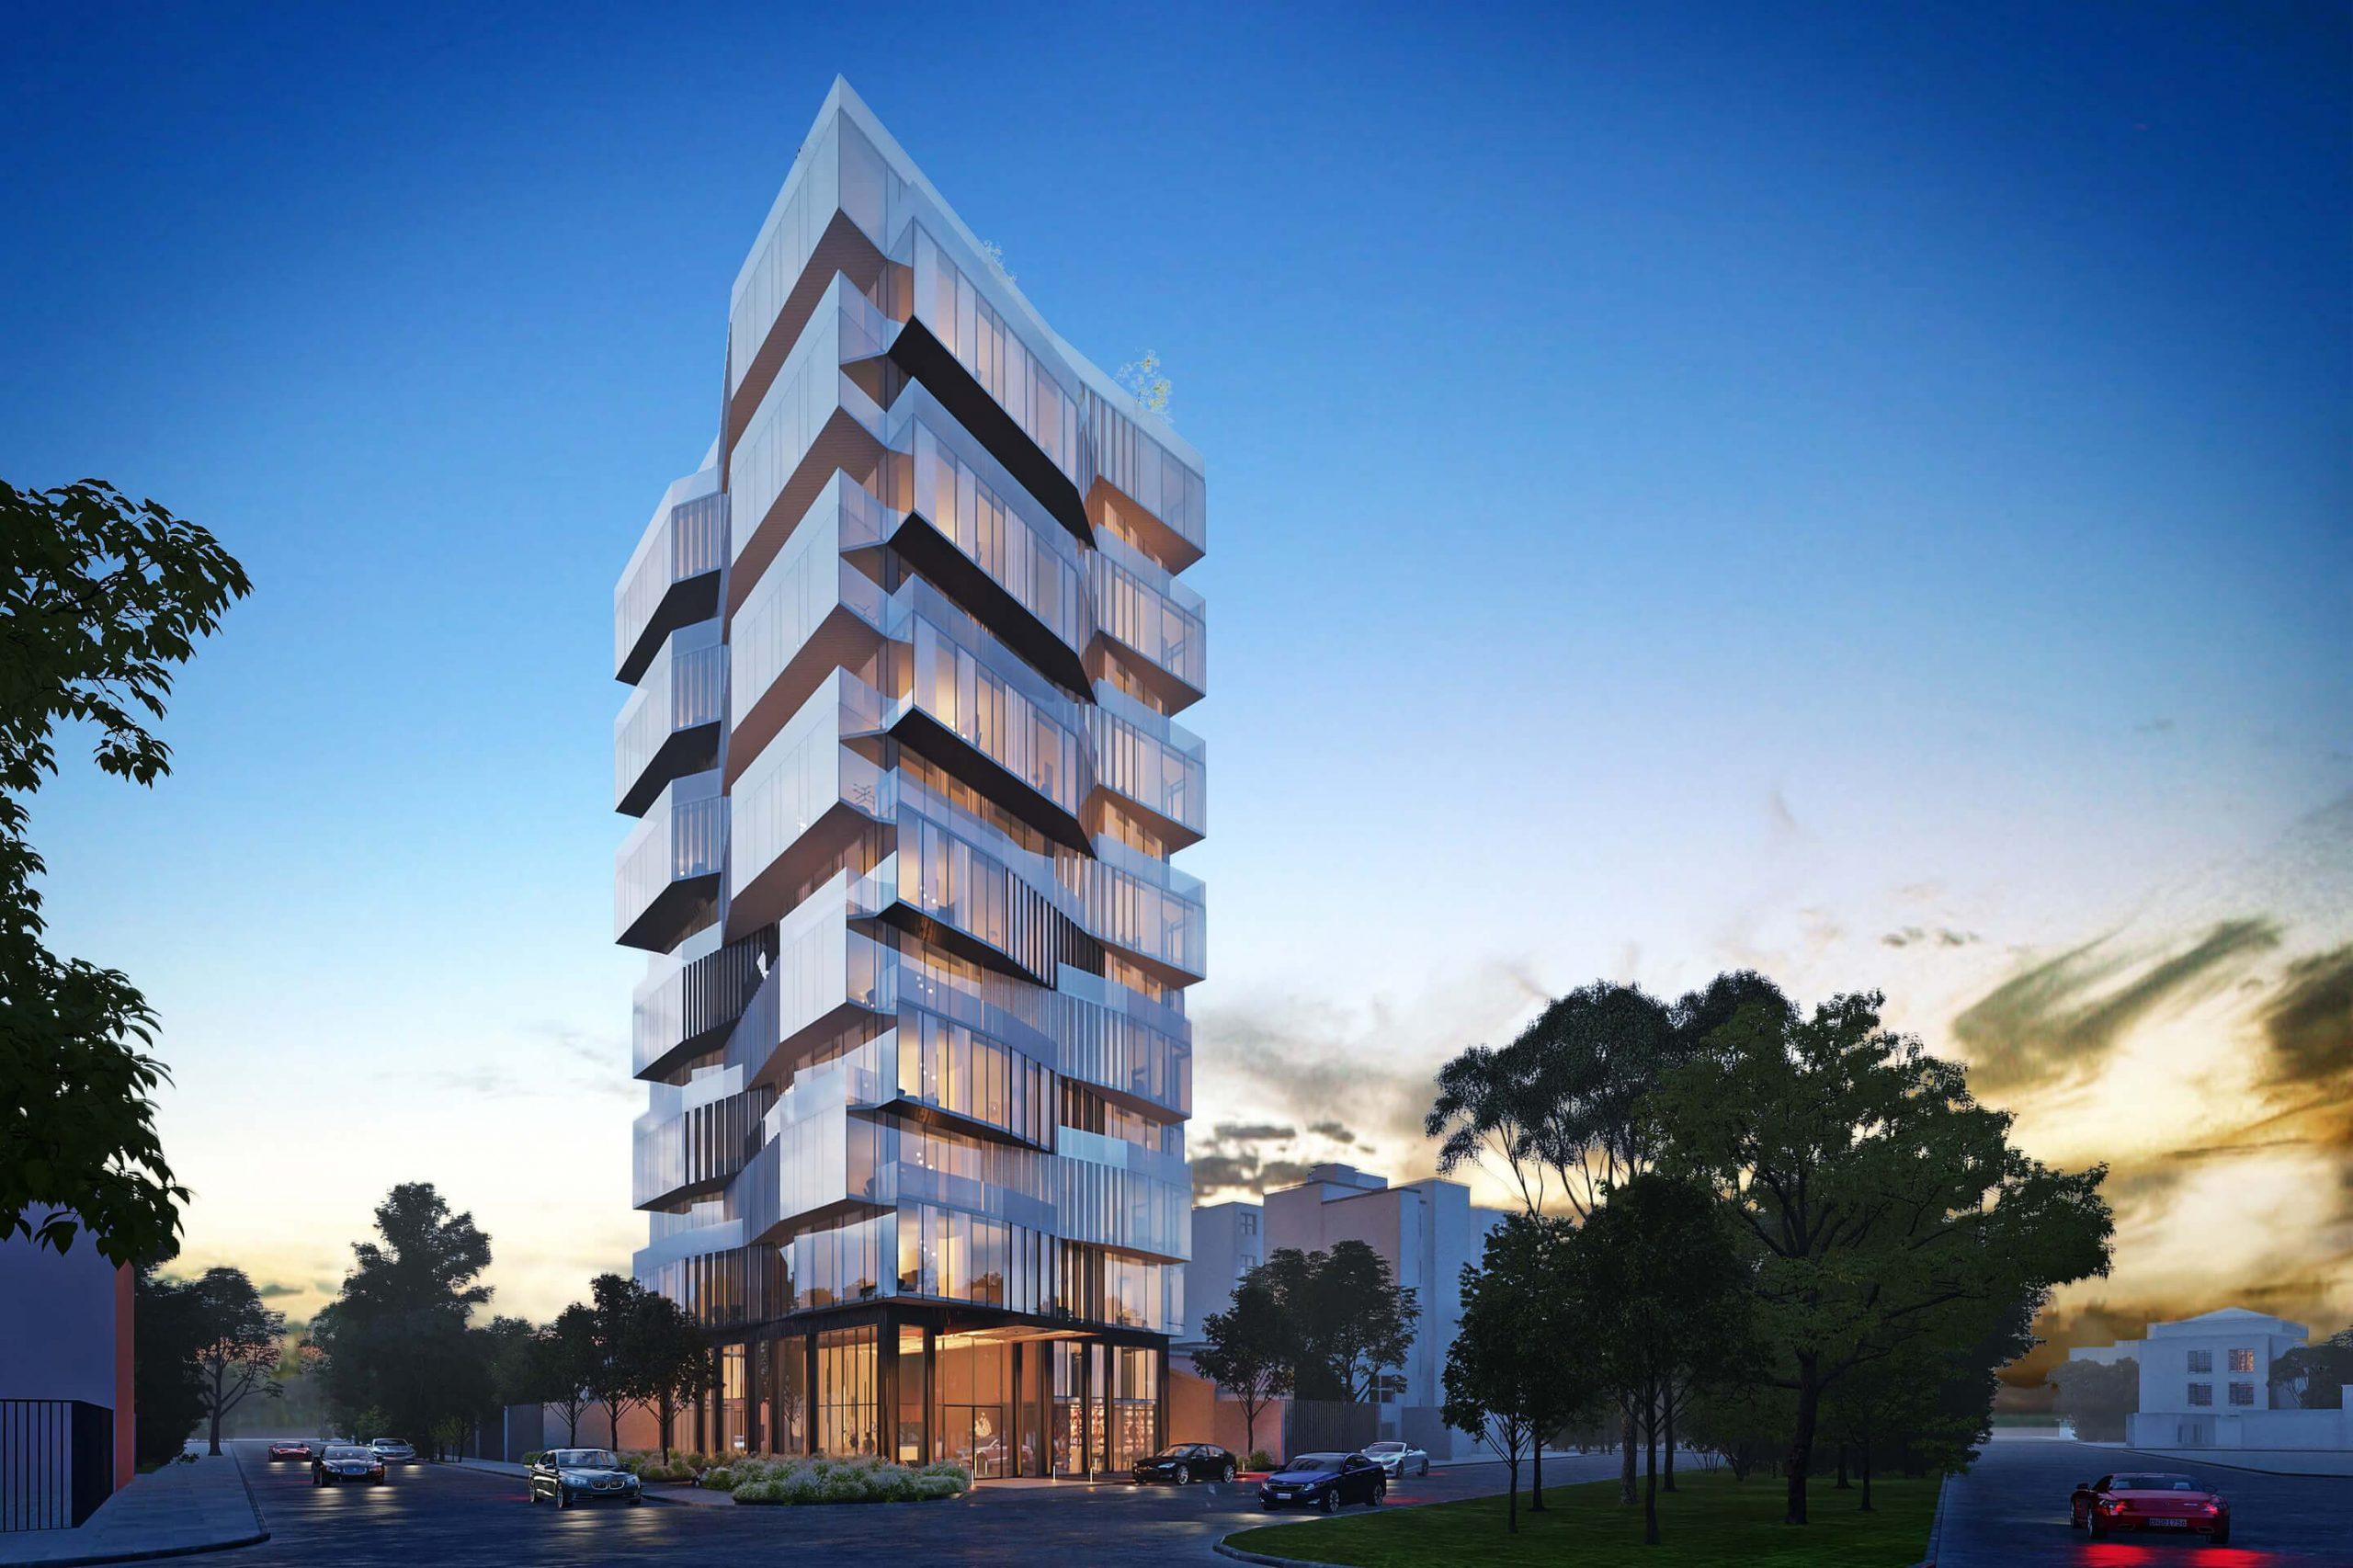 PABLO CASALS RESIDENCES <br/> New residental development